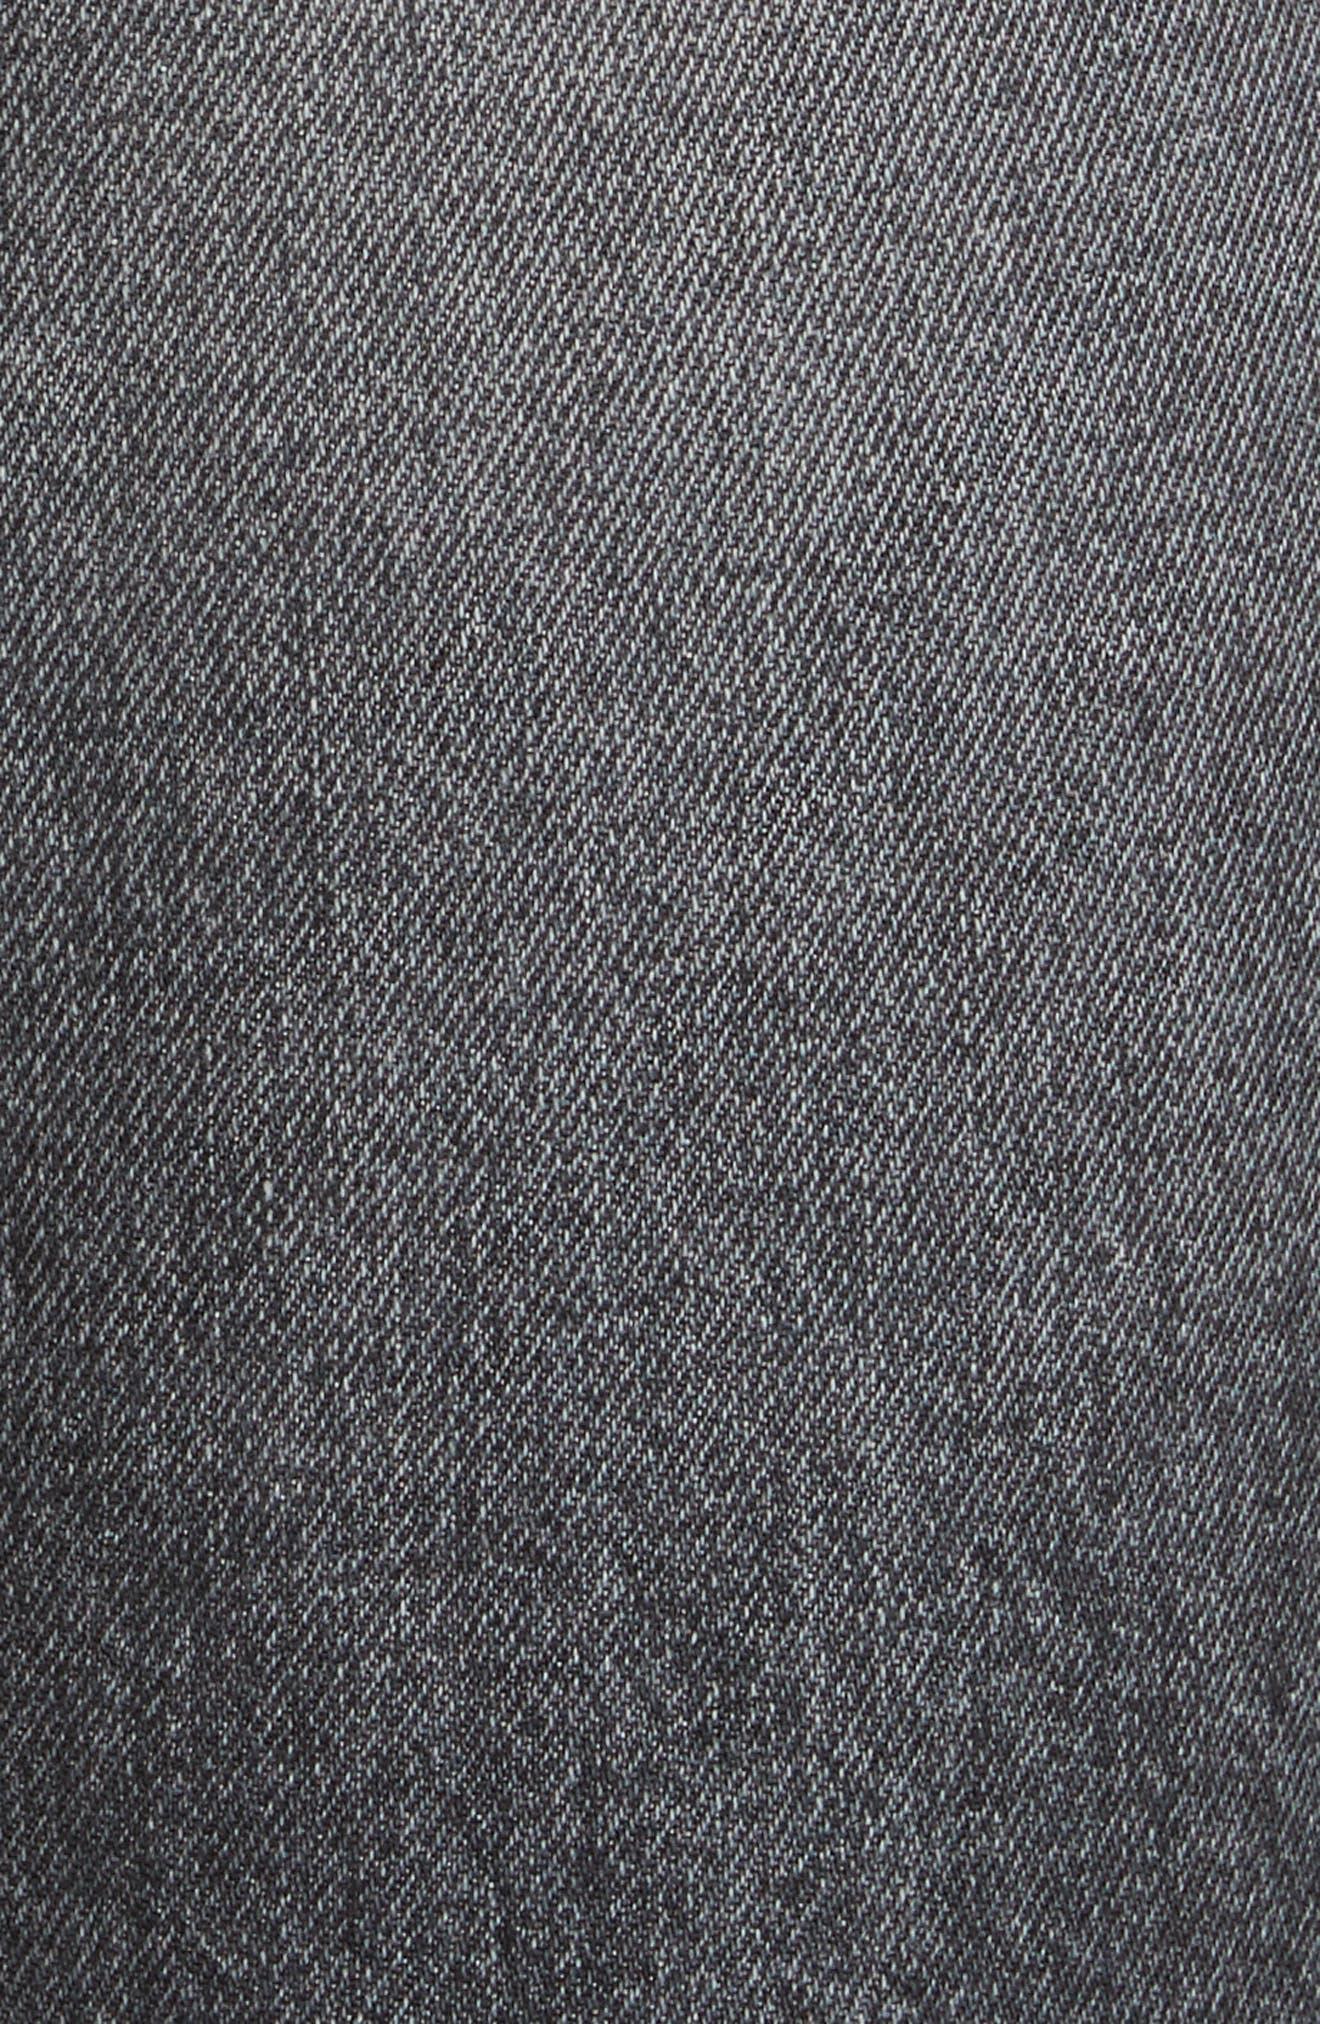 Karolina High Waist Skinny Jeans,                             Alternate thumbnail 5, color,                             Flint